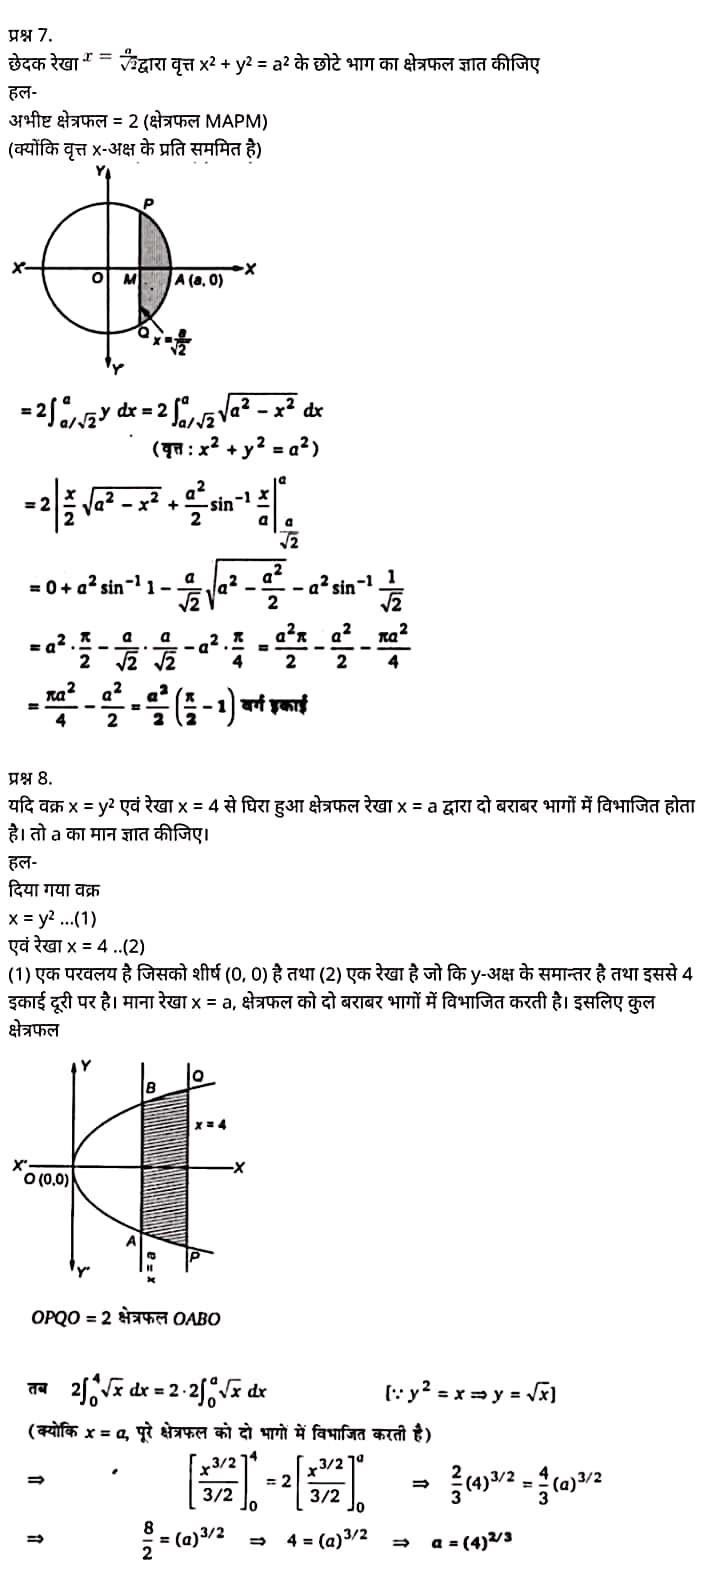 """Class 12 Maths Chapter 8"", ""Application of Integrals"", Hindi Medium मैथ्स कक्षा 12 नोट्स pdf,  मैथ्स कक्षा 12 नोट्स 2021 NCERT,  मैथ्स कक्षा 12 PDF,  मैथ्स पुस्तक,  मैथ्स की बुक,  मैथ्स प्रश्नोत्तरी Class 12, 12 वीं मैथ्स पुस्तक RBSE,  बिहार बोर्ड 12 वीं मैथ्स नोट्स,   12th Maths book in hindi,12th Maths notes in hindi,cbse books for class 12,cbse books in hindi,cbse ncert books,class 12 Maths notes in hindi,class 12 hindi ncert solutions,Maths 2020,Maths 2021,Maths 2022,Maths book class 12,Maths book in hindi,Maths class 12 in hindi,Maths notes for class 12 up board in hindi,ncert all books,ncert app in hindi,ncert book solution,ncert books class 10,ncert books class 12,ncert books for class 7,ncert books for upsc in hindi,ncert books in hindi class 10,ncert books in hindi for class 12 Maths,ncert books in hindi for class 6,ncert books in hindi pdf,ncert class 12 hindi book,ncert english book,ncert Maths book in hindi,ncert Maths books in hindi pdf,ncert Maths class 12,ncert in hindi,old ncert books in hindi,online ncert books in hindi,up board 12th,up board 12th syllabus,up board class 10 hindi book,up board class 12 books,up board class 12 new syllabus,up Board Maths 2020,up Board Maths 2021,up Board Maths 2022,up Board Maths 2023,up board intermediate Maths syllabus,up board intermediate syllabus 2021,Up board Master 2021,up board model paper 2021,up board model paper all subject,up board new syllabus of class 12th Maths,up board paper 2021,Up board syllabus 2021,UP board syllabus 2022,  12 वीं मैथ्स पुस्तक हिंदी में, 12 वीं मैथ्स नोट्स हिंदी में, कक्षा 12 के लिए सीबीएससी पुस्तकें, हिंदी में सीबीएससी पुस्तकें, सीबीएससी  पुस्तकें, कक्षा 12 मैथ्स नोट्स हिंदी में, कक्षा 12 हिंदी एनसीईआरटी समाधान, मैथ्स 2020, मैथ्स 2021, मैथ्स 2022, मैथ्स  बुक क्लास 12, मैथ्स बुक इन हिंदी, बायोलॉजी क्लास 12 हिंदी में, मैथ्स नोट्स इन क्लास 12 यूपी  बोर्ड इन हिंदी, एनसीईआरटी मैथ्स की किताब हिंदी में,  बोर्ड 12 वीं तक, 12 वीं तक की पाठ्यक्रम, बोर्ड कक्षा 10 की हिंदी पुस्तक  , बोर्ड की"